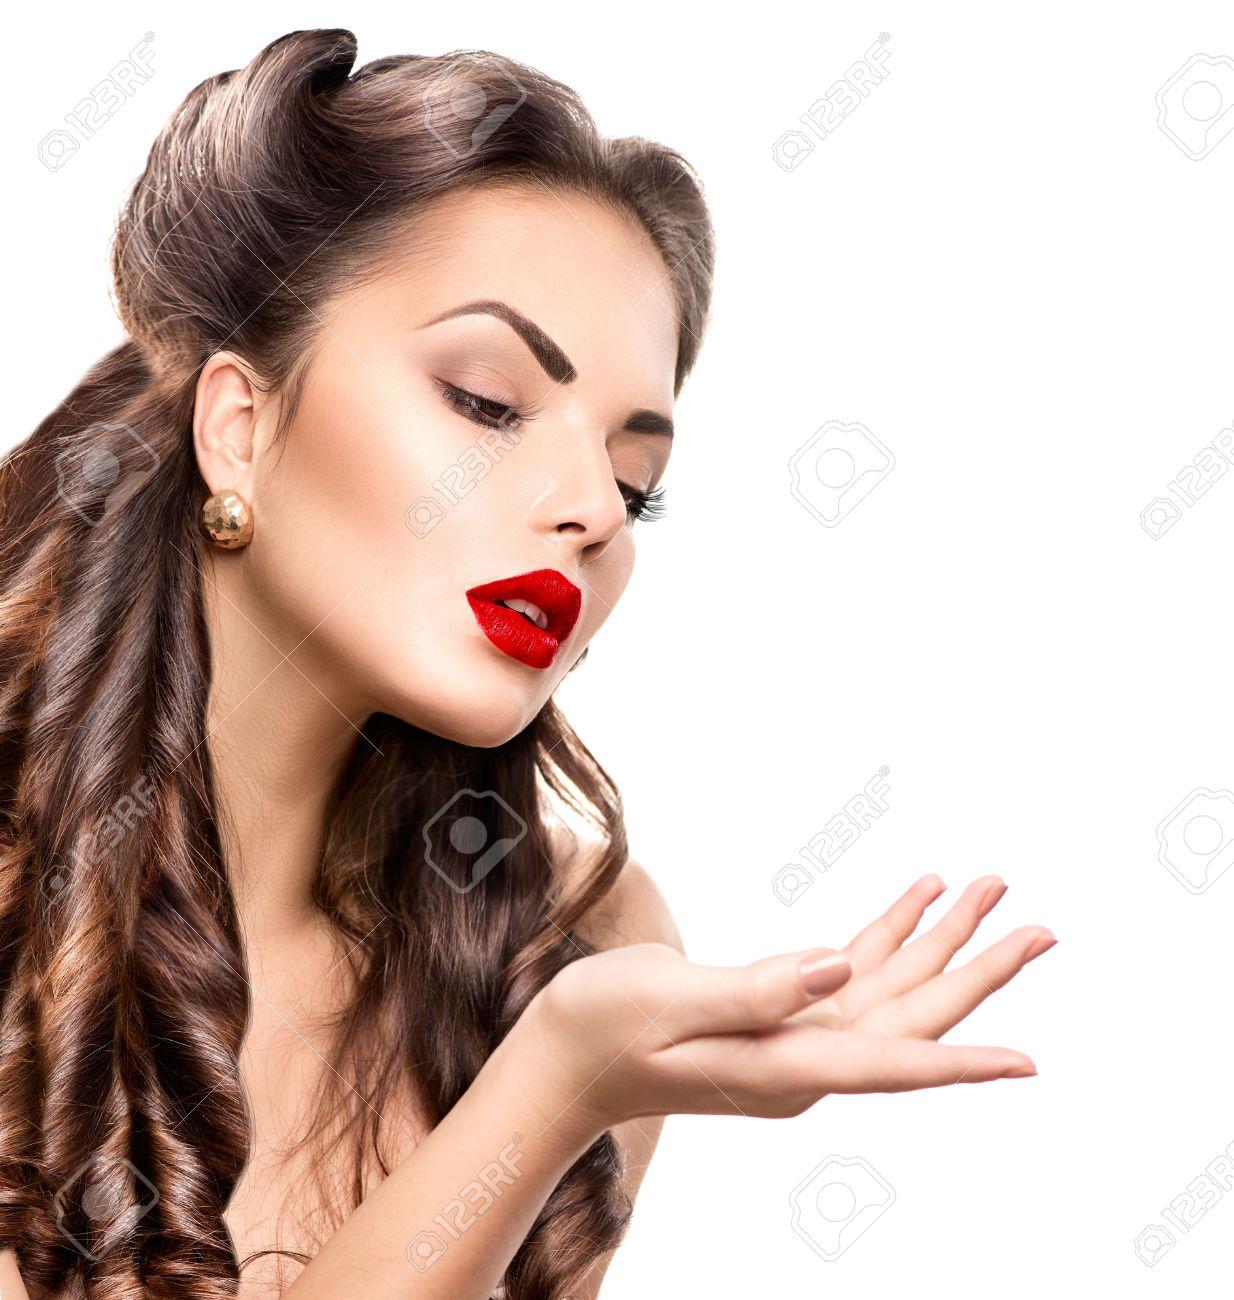 Retro woman portrait beauty girl showing empty copy space stock photo 41225421